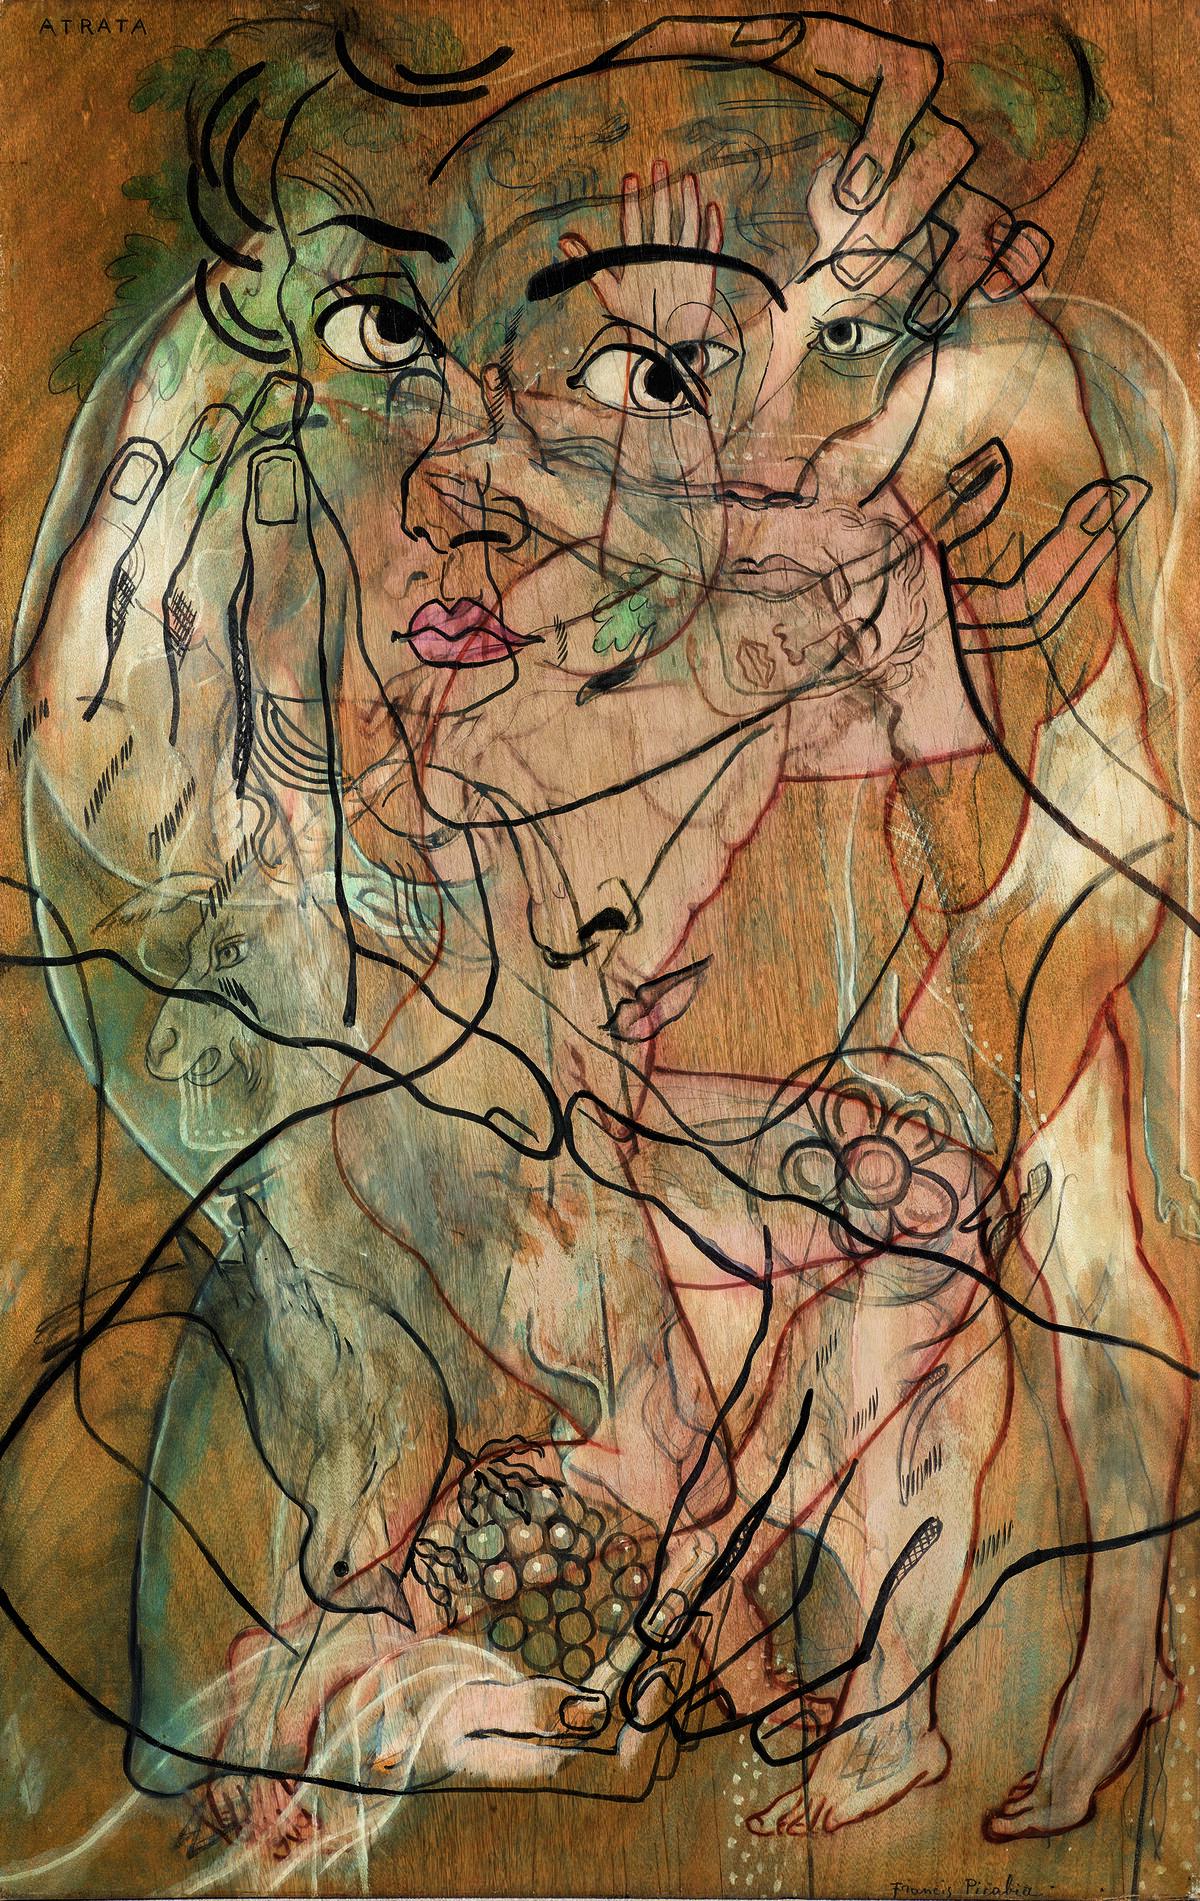 Francis Picabia, Atrata, 1929. Courtesy of Sotheby's.